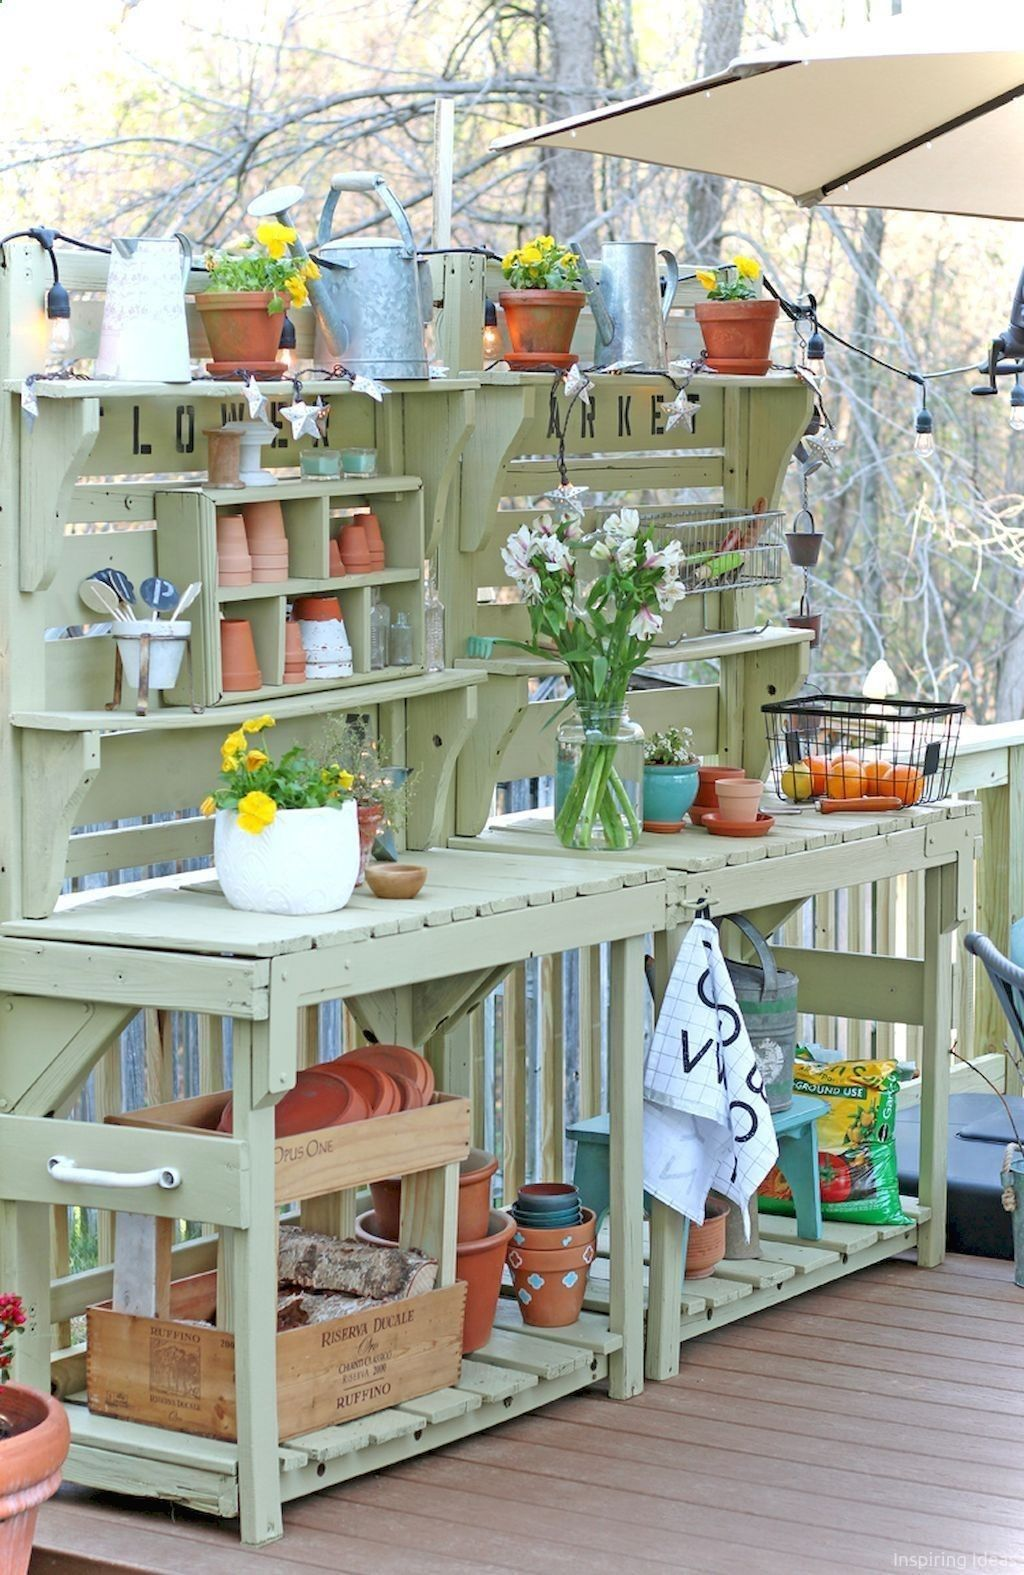 shed diy shed diy cool 57 inspiring garden shed ideas you can rh pinterest com